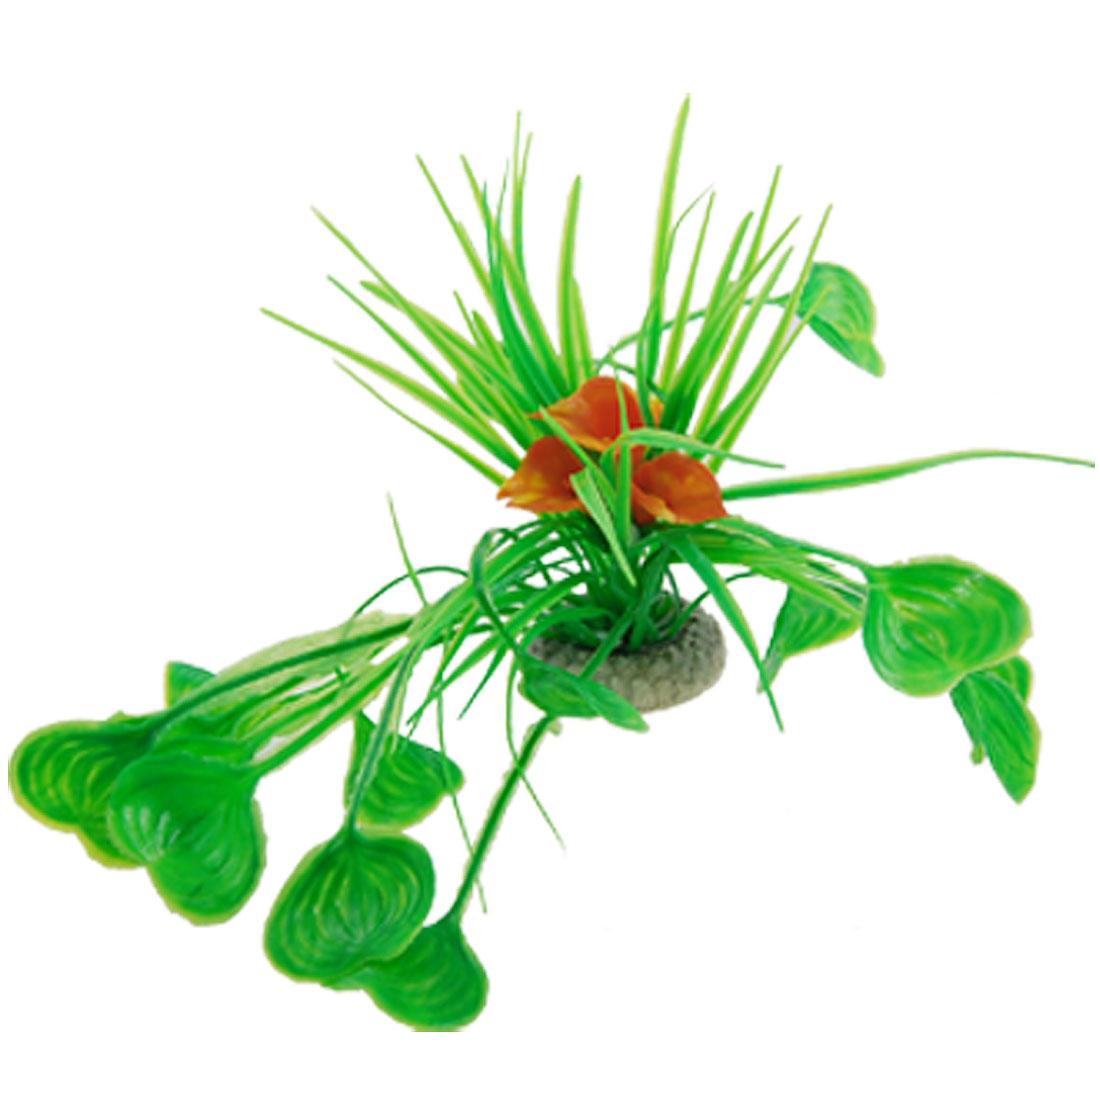 Tank Emulational Orange Flower Green Heart Shaped Leaves Plants Decor